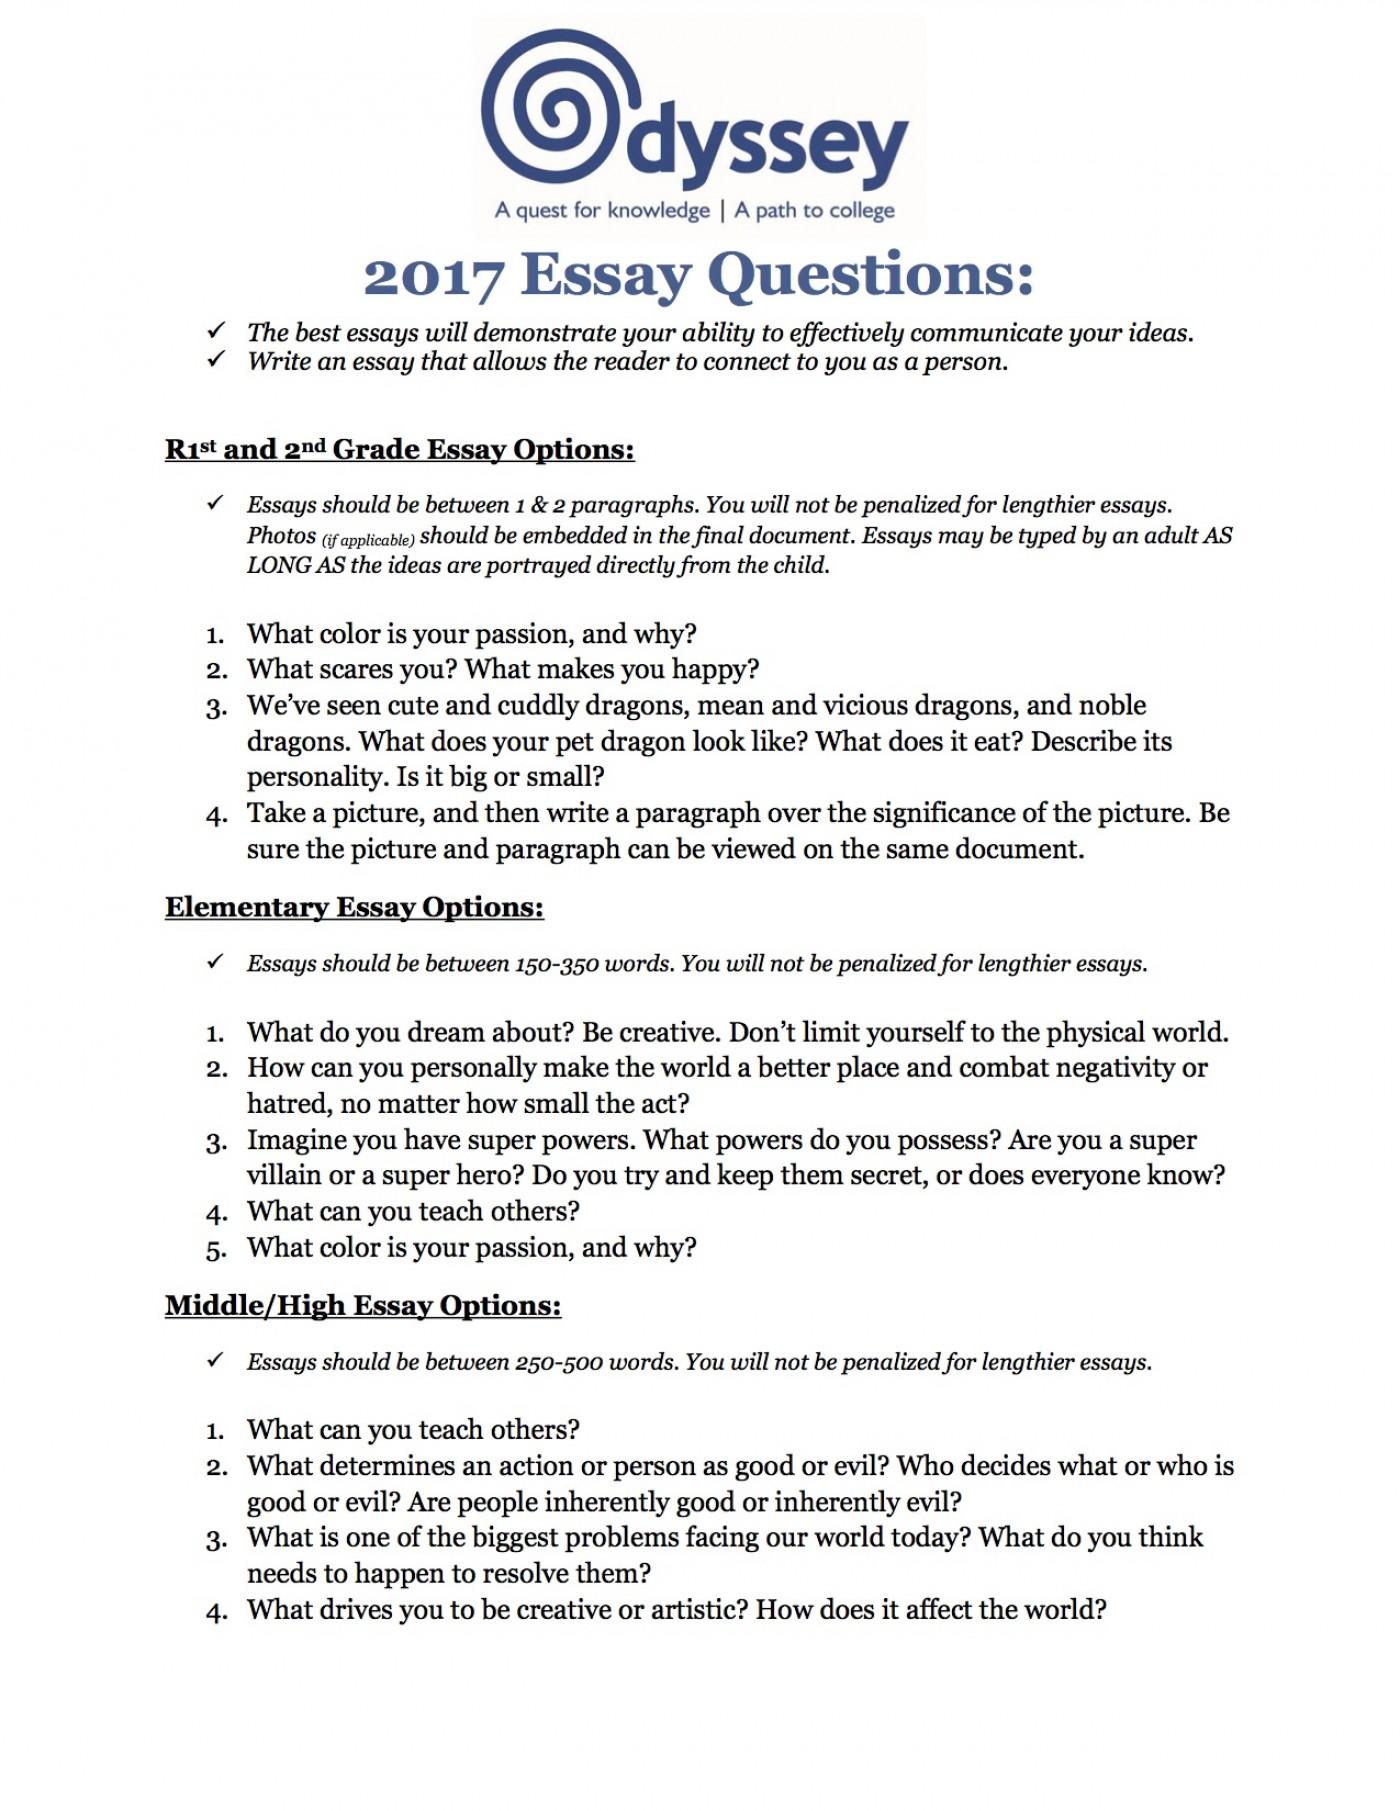 015 Best Essay Topics Example 5829f1d2c75f9a7c5588b1c6 Proposed20essay20topics202017 Surprising Research Paper For College Student High School Argumentative 1400